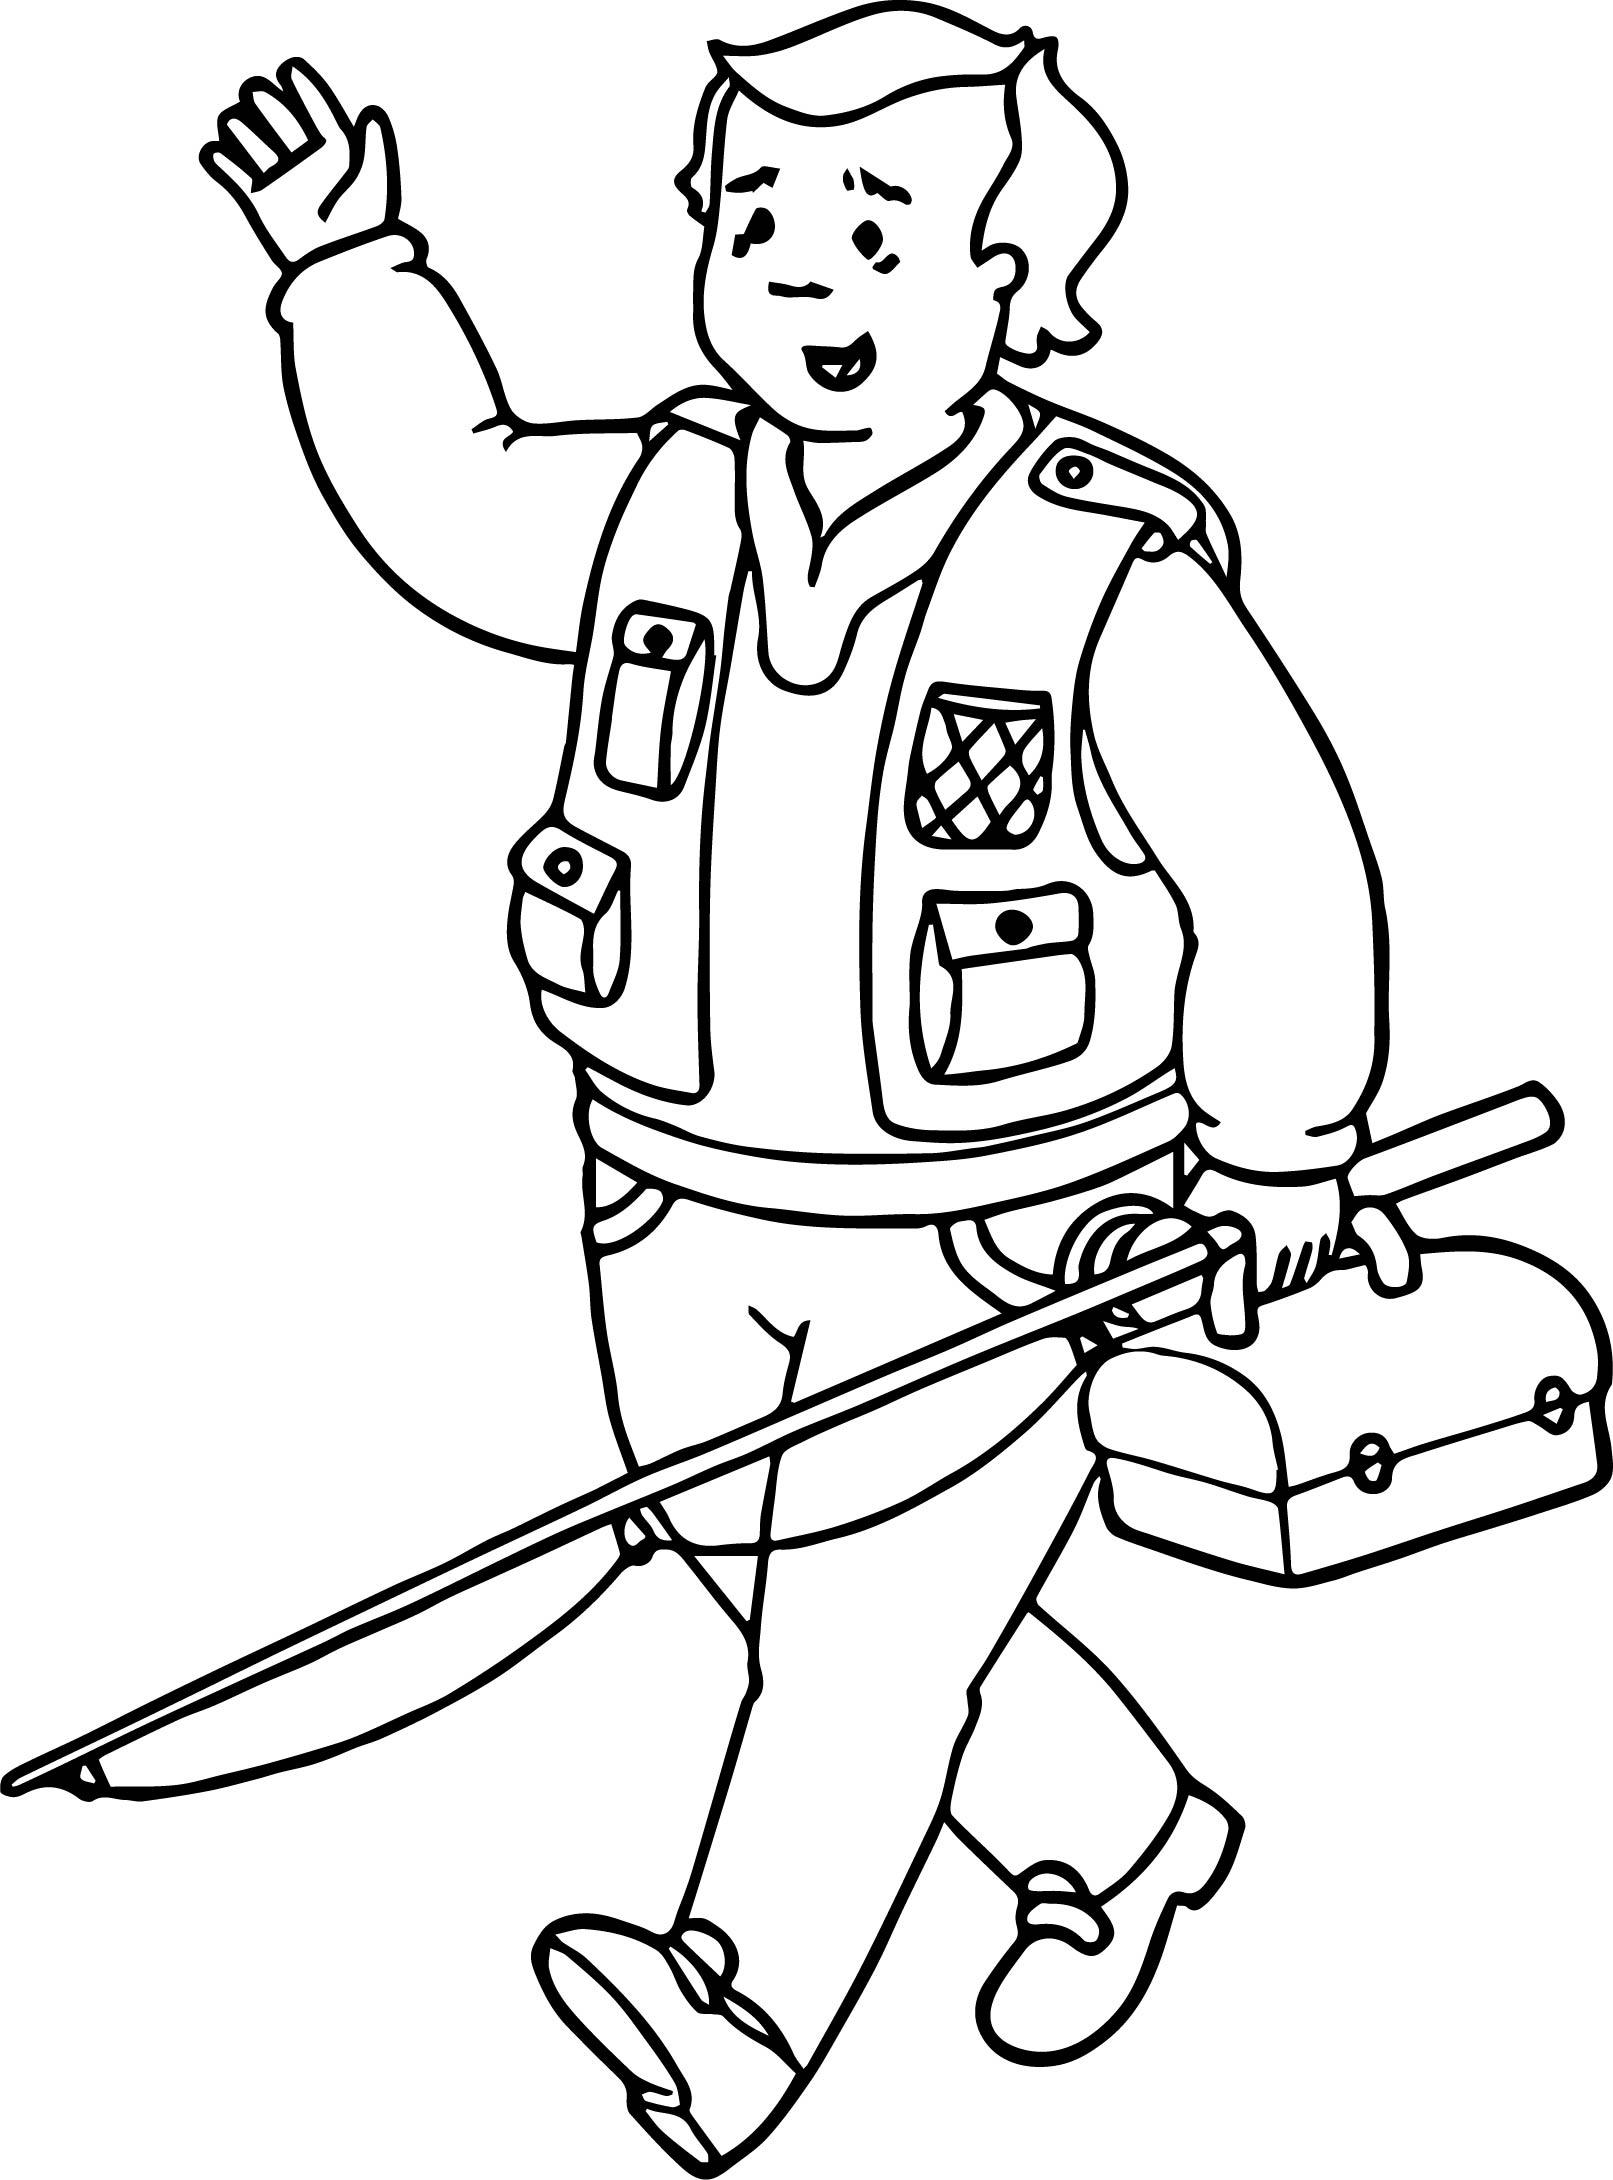 Caillou Fishing Man Coloring Page